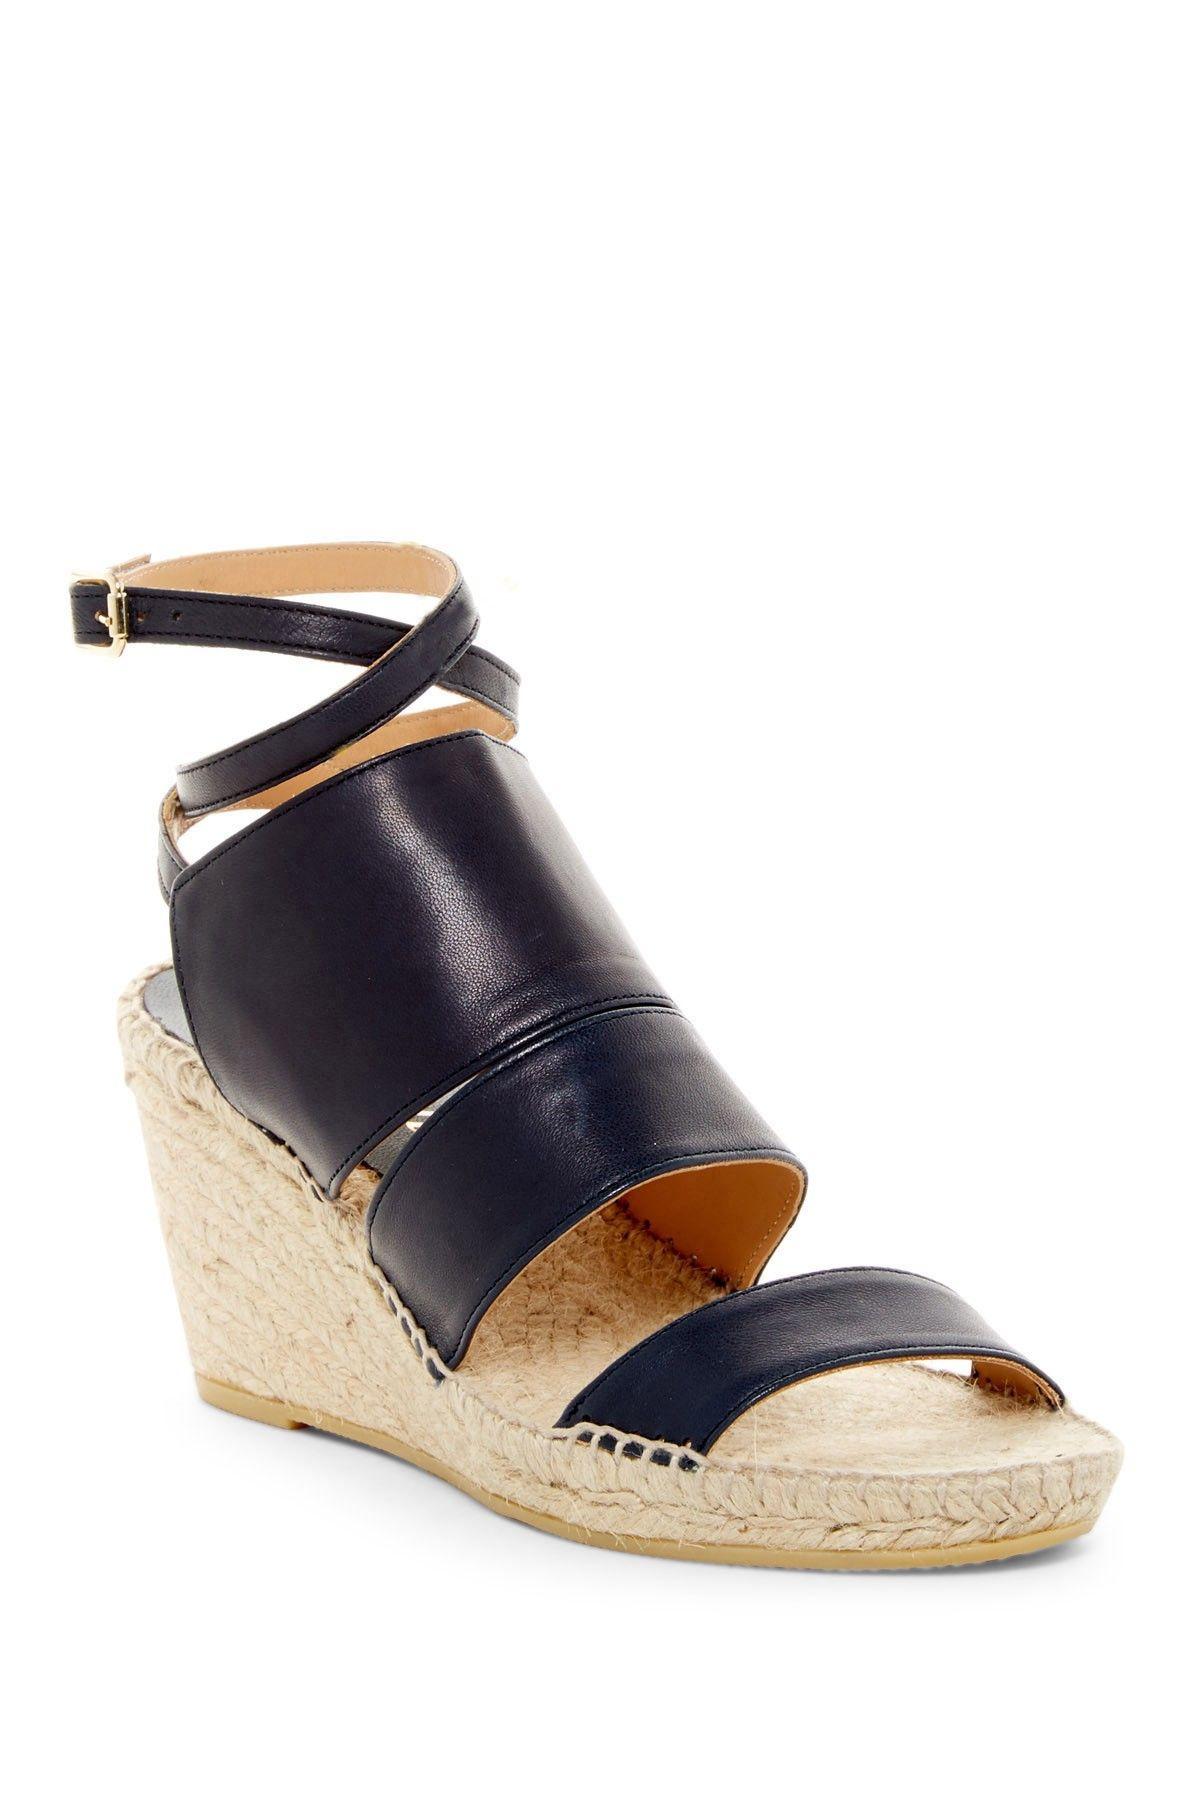 Bettye Muller  Dusty Espadrille Wedge Sandal  Wedge -6233